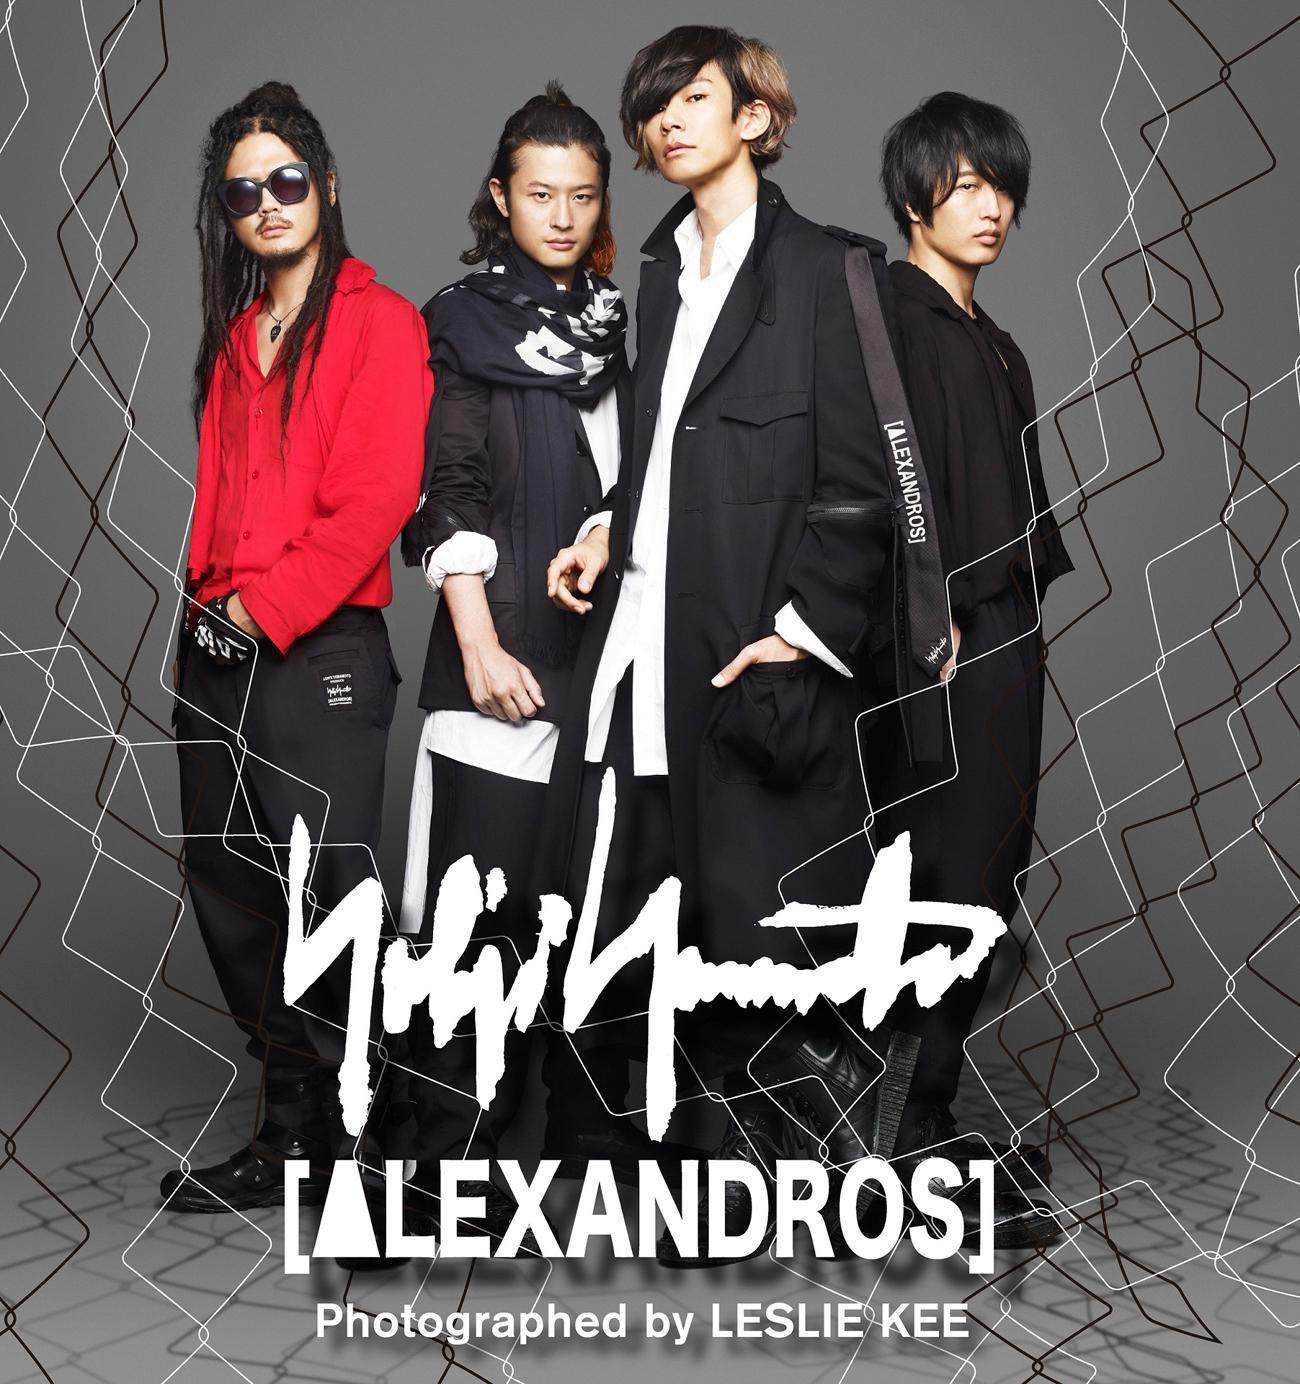 [Alexandros]×ヨウジヤマモト